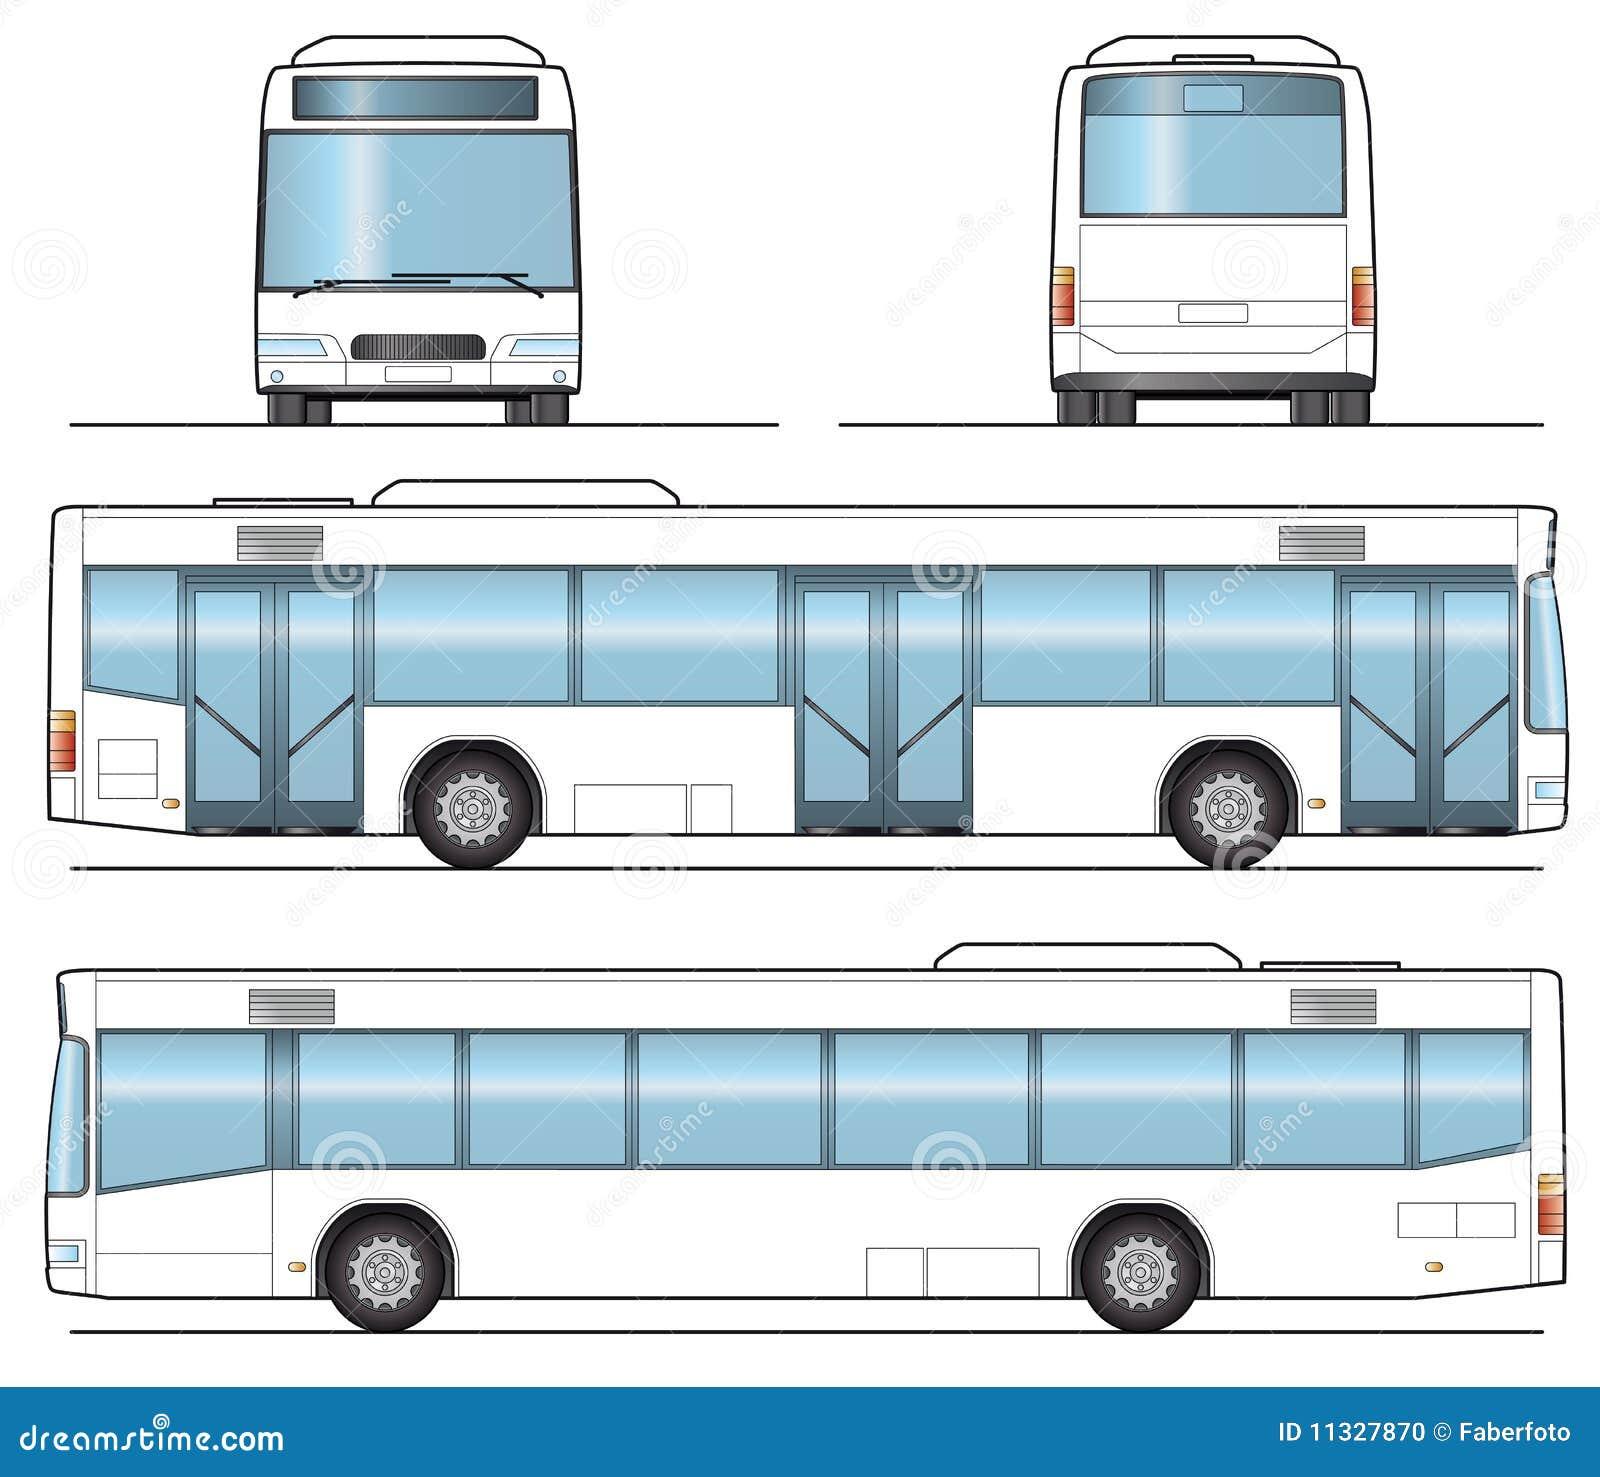 public bus template stock photo image 11327870. Black Bedroom Furniture Sets. Home Design Ideas